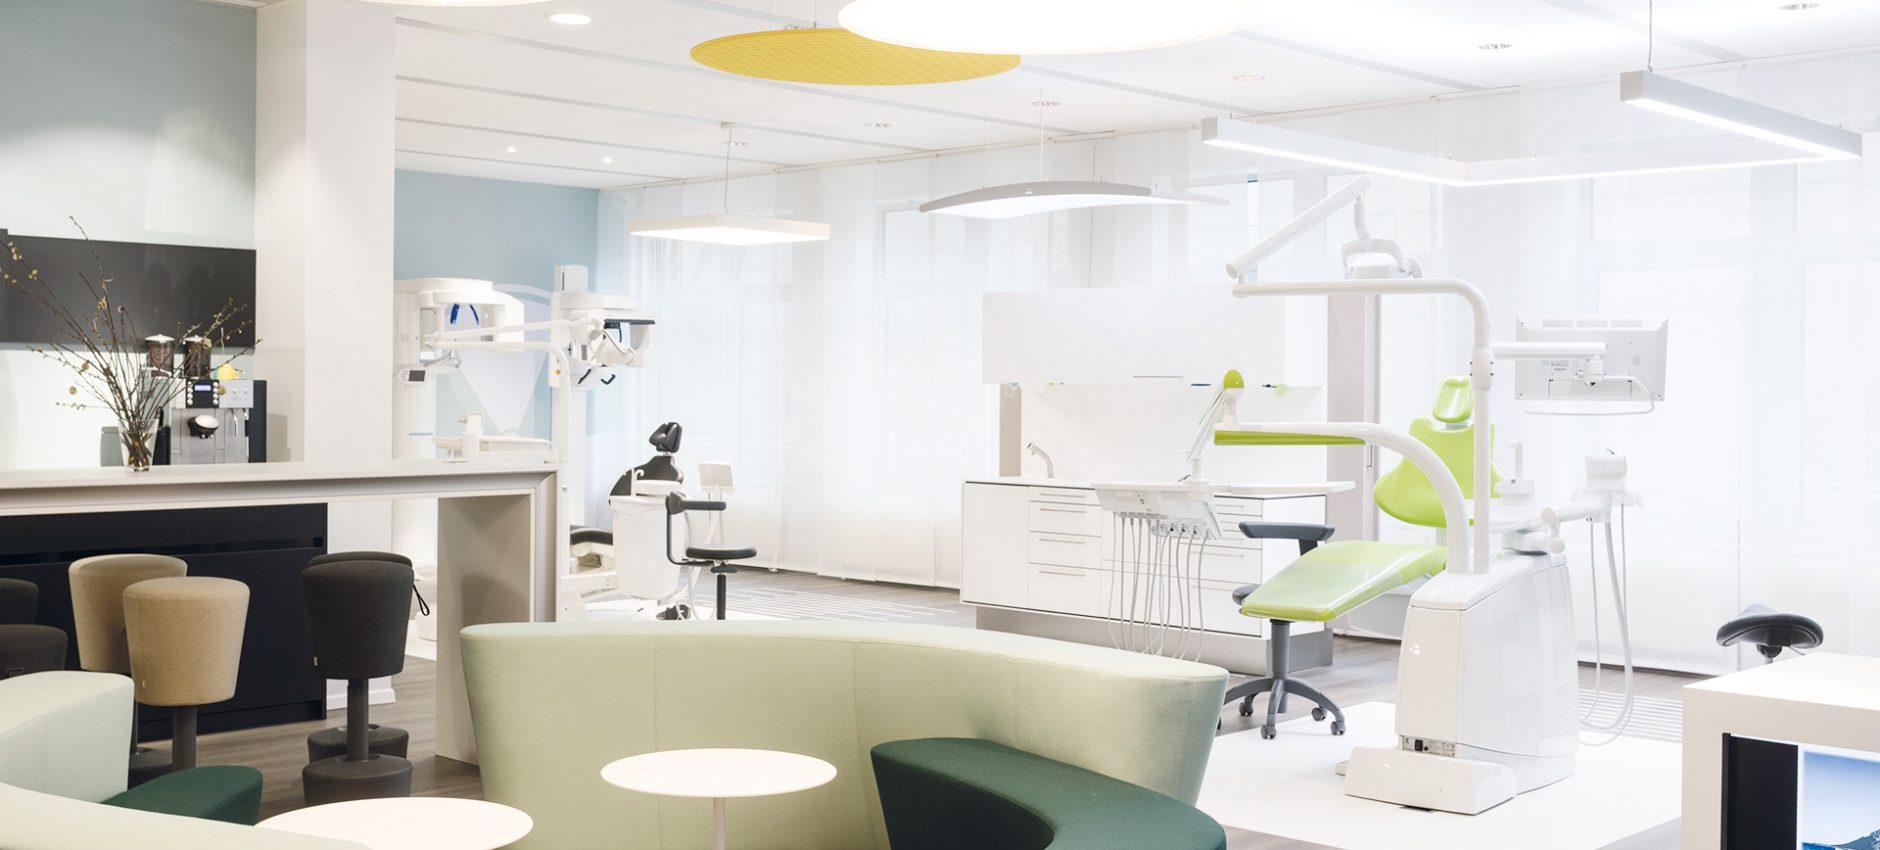 0012_GERL_DentalShowroom_Zaehne_1920x1000_72dpi.jpg